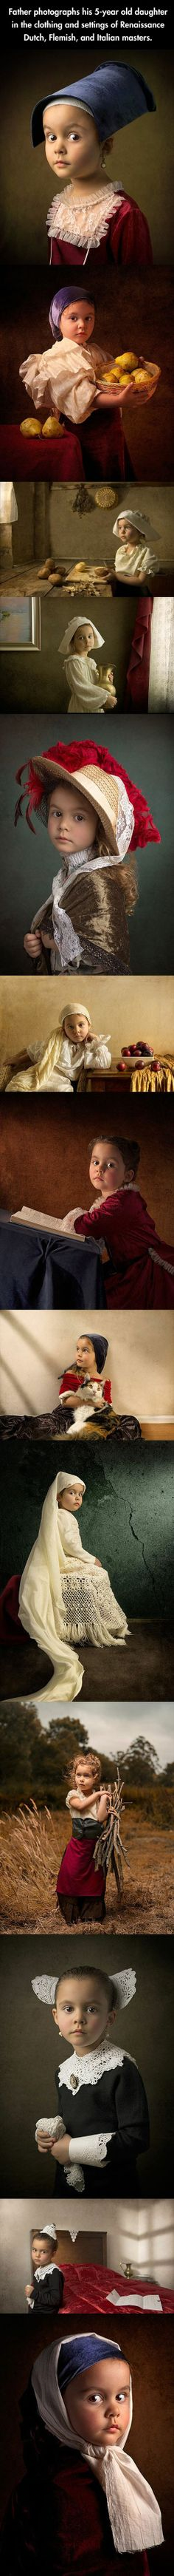 Photographer Bill Gekas' portraits of his little daughter.